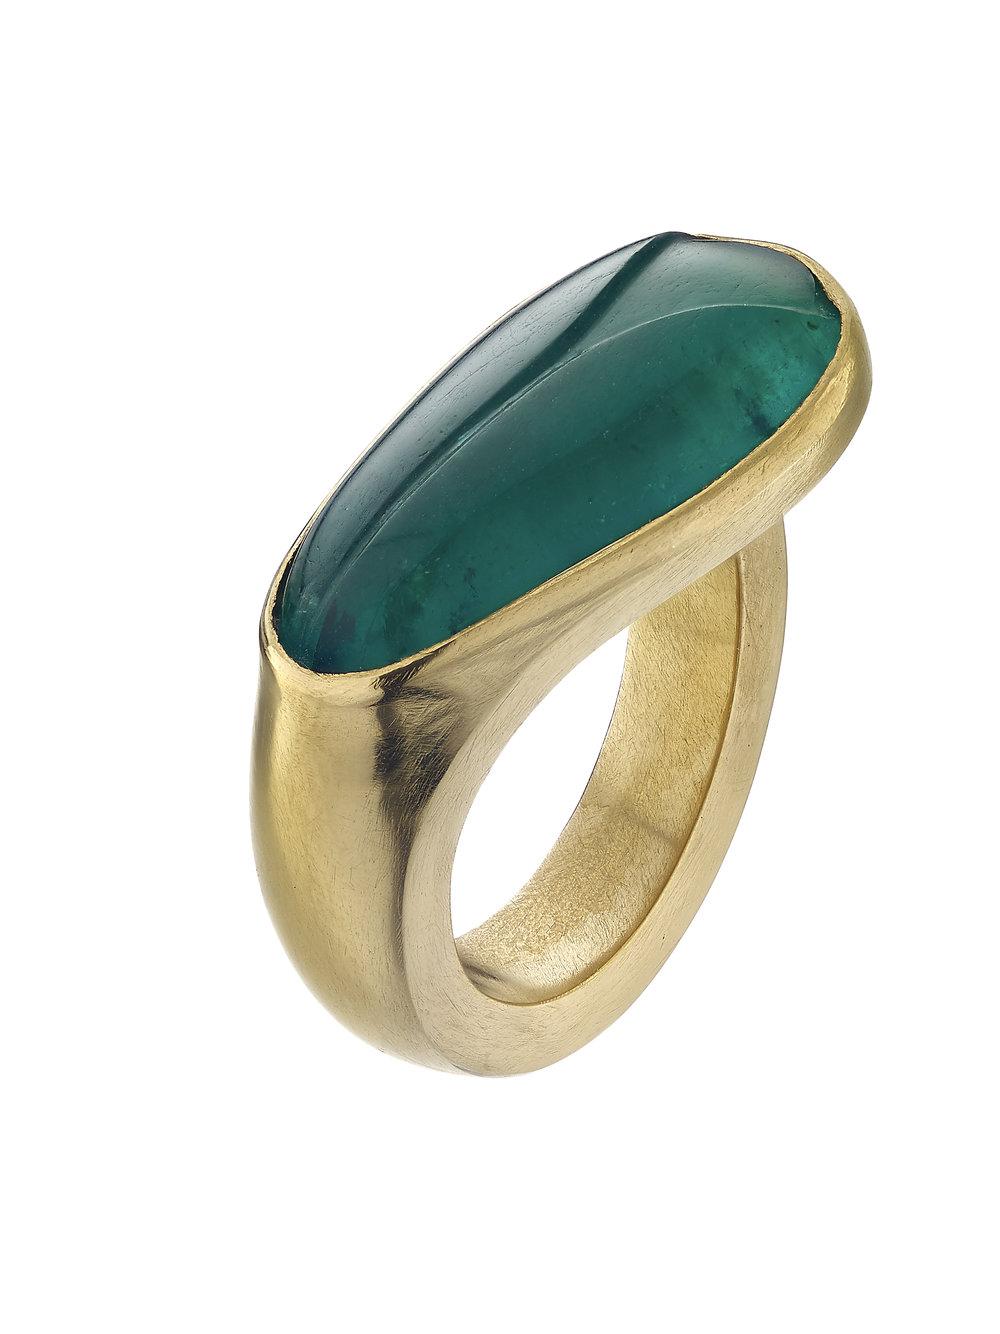 emerald ring 2016.jpg